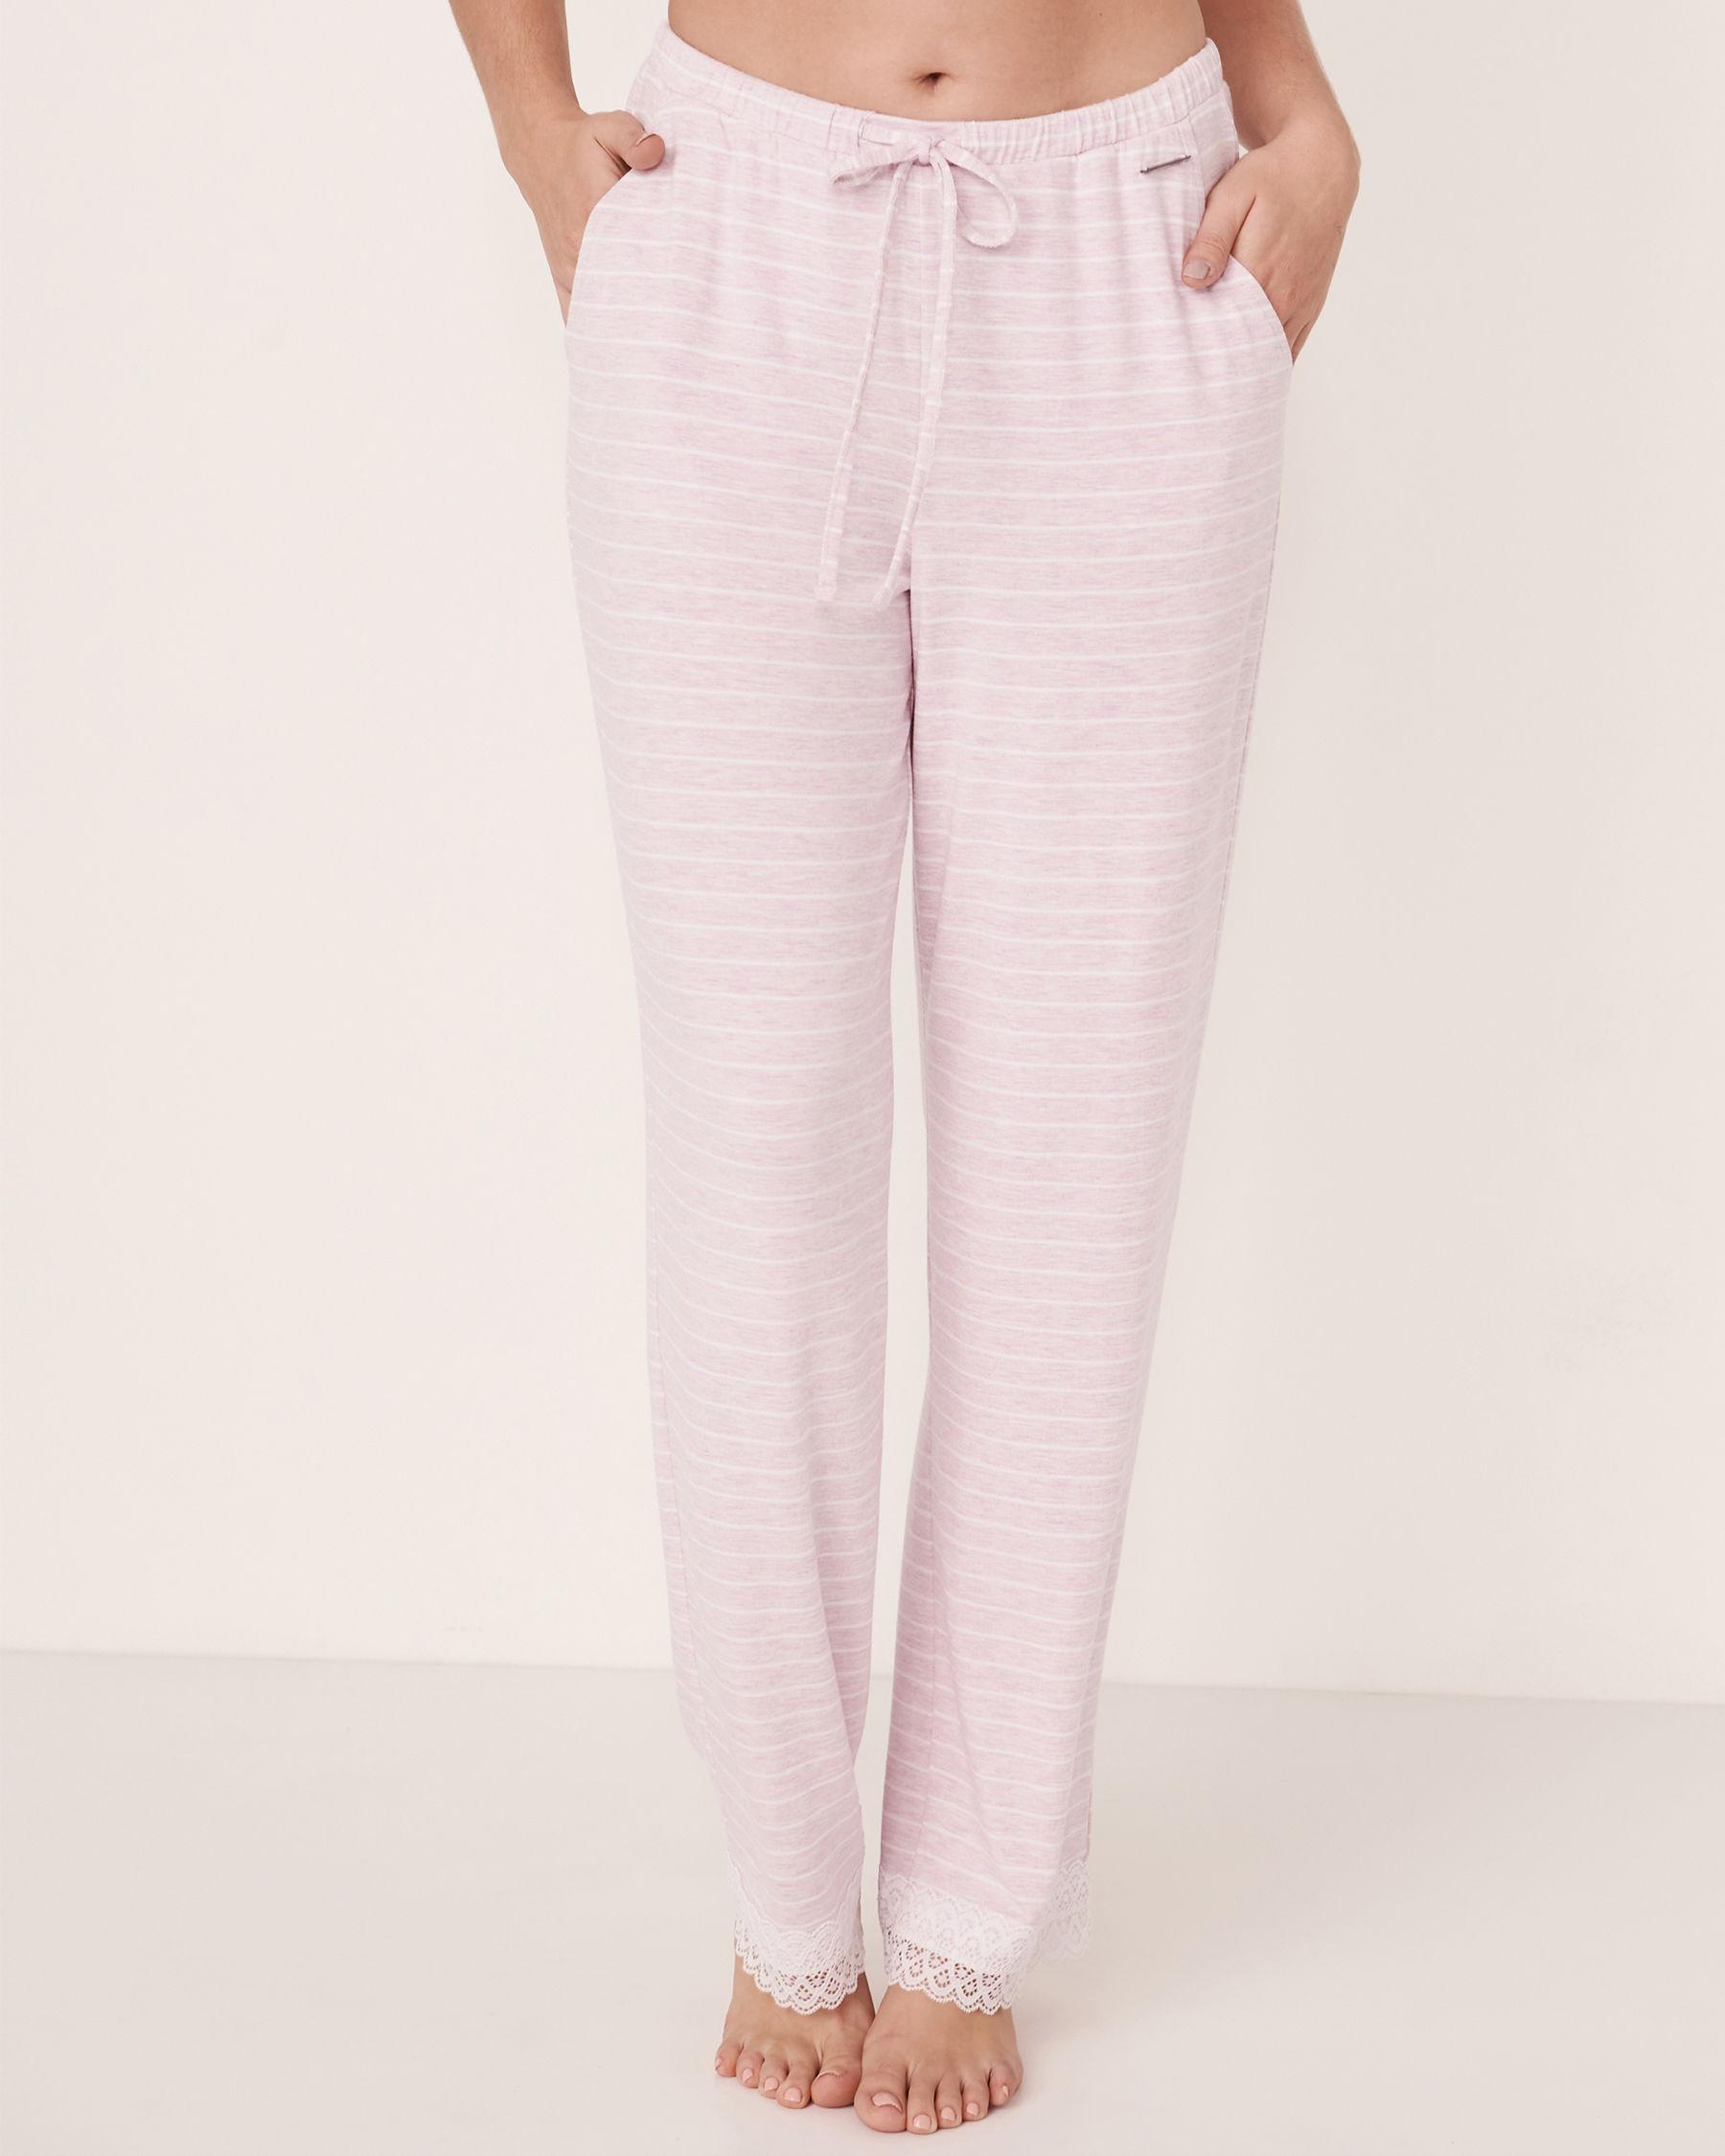 LA VIE EN ROSE Lace Trim Straight Leg Pant Stripes 50200005 - View1